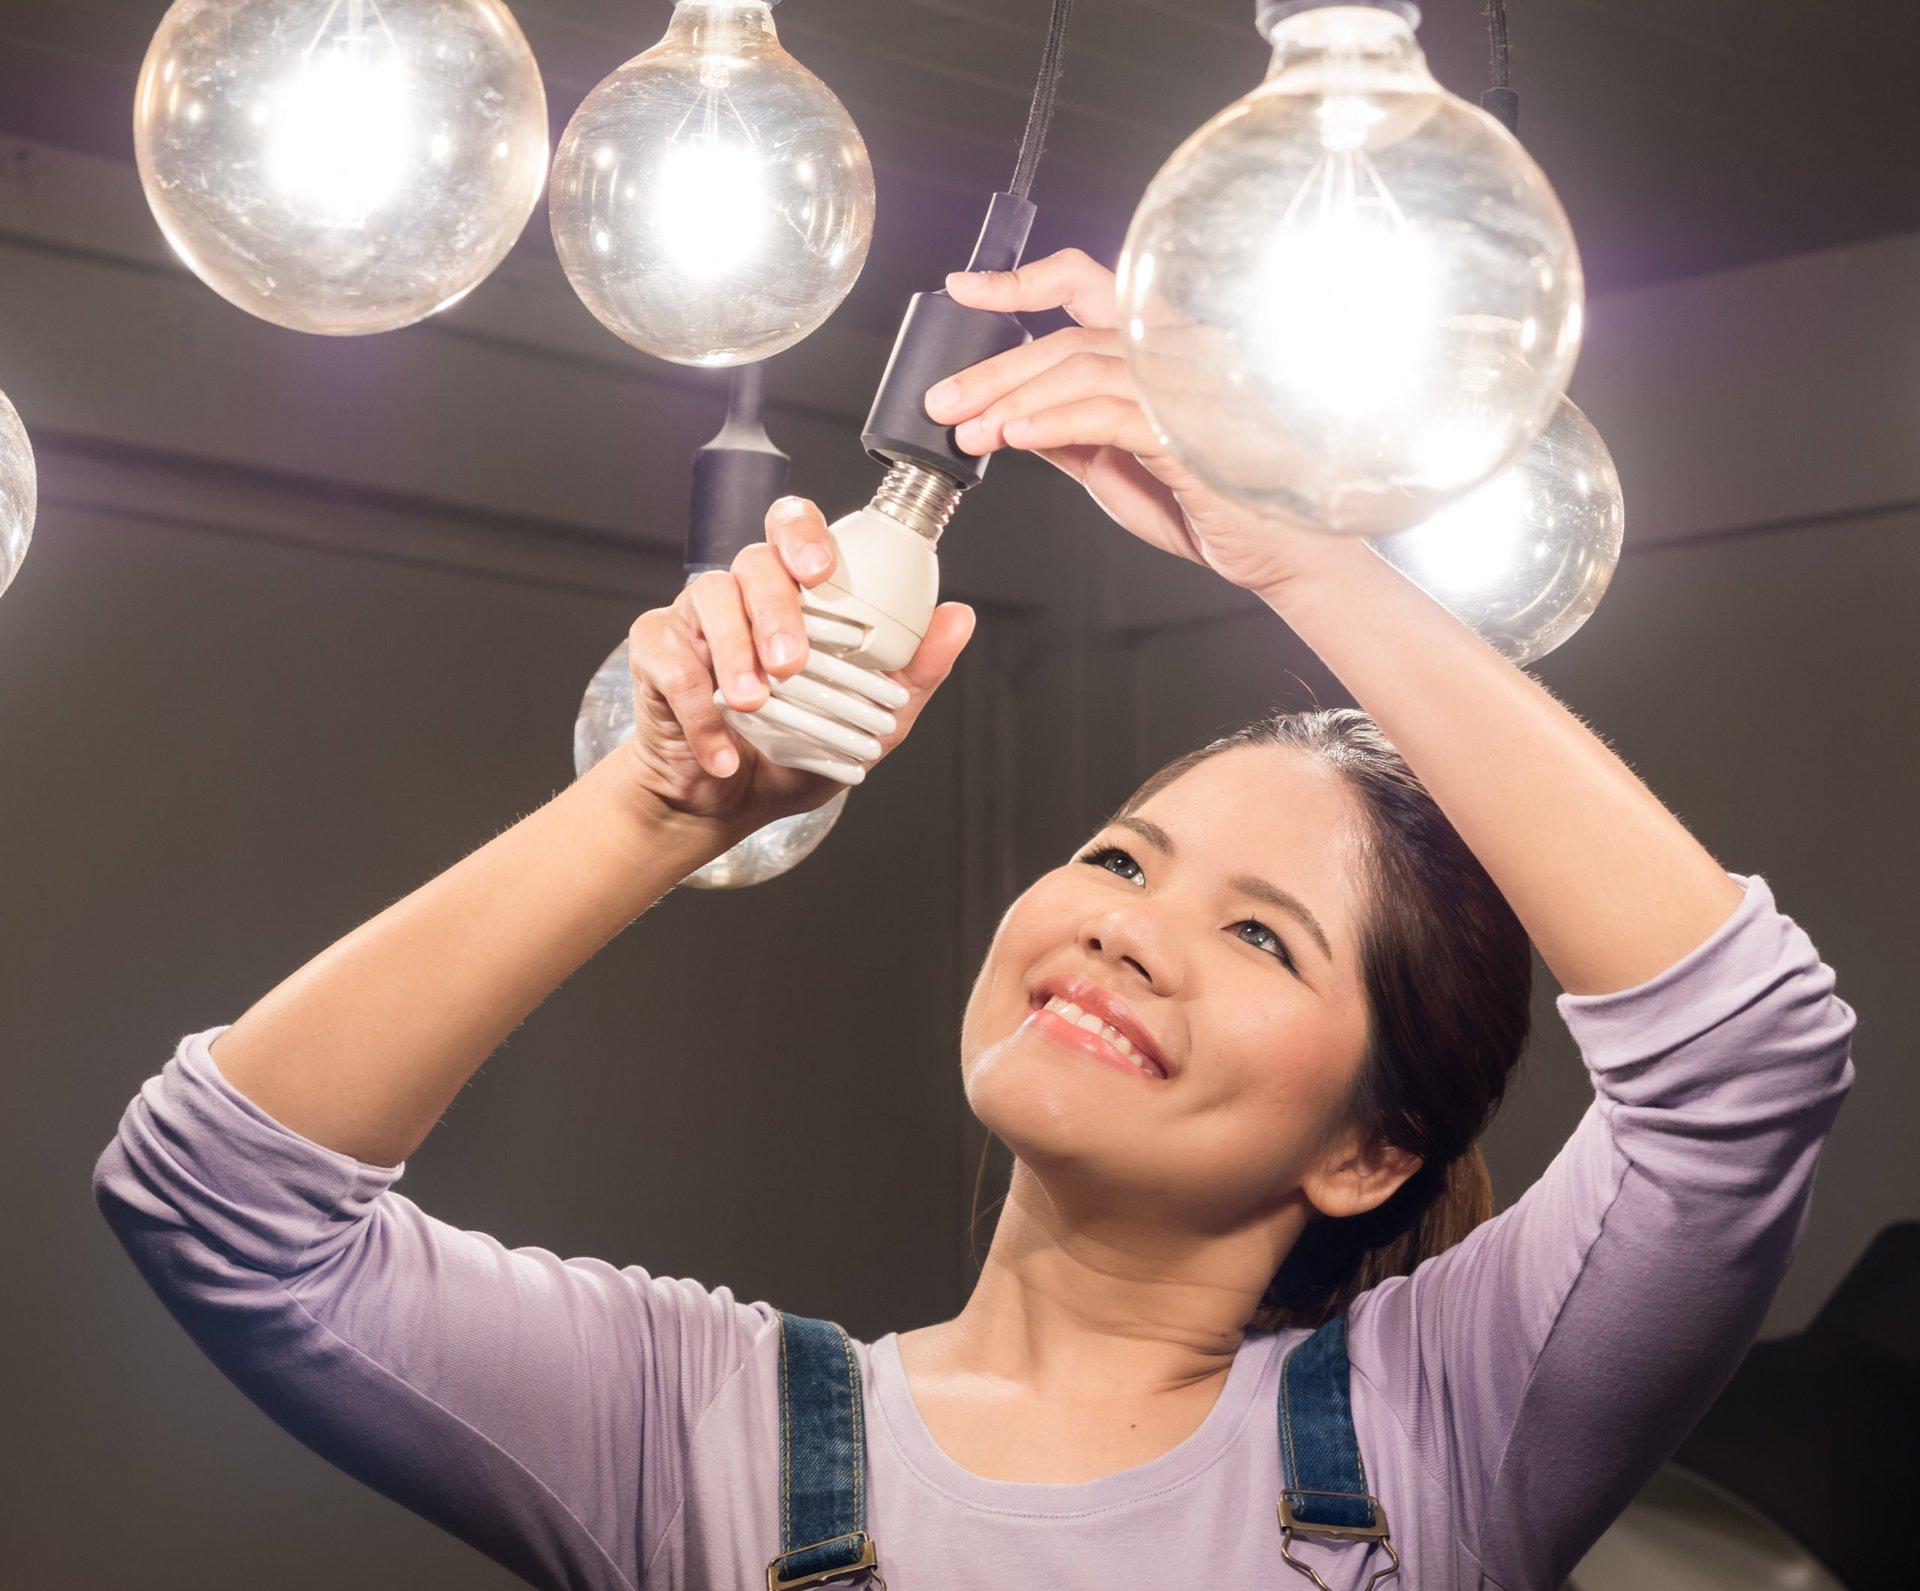 Woman changing lightbulbs